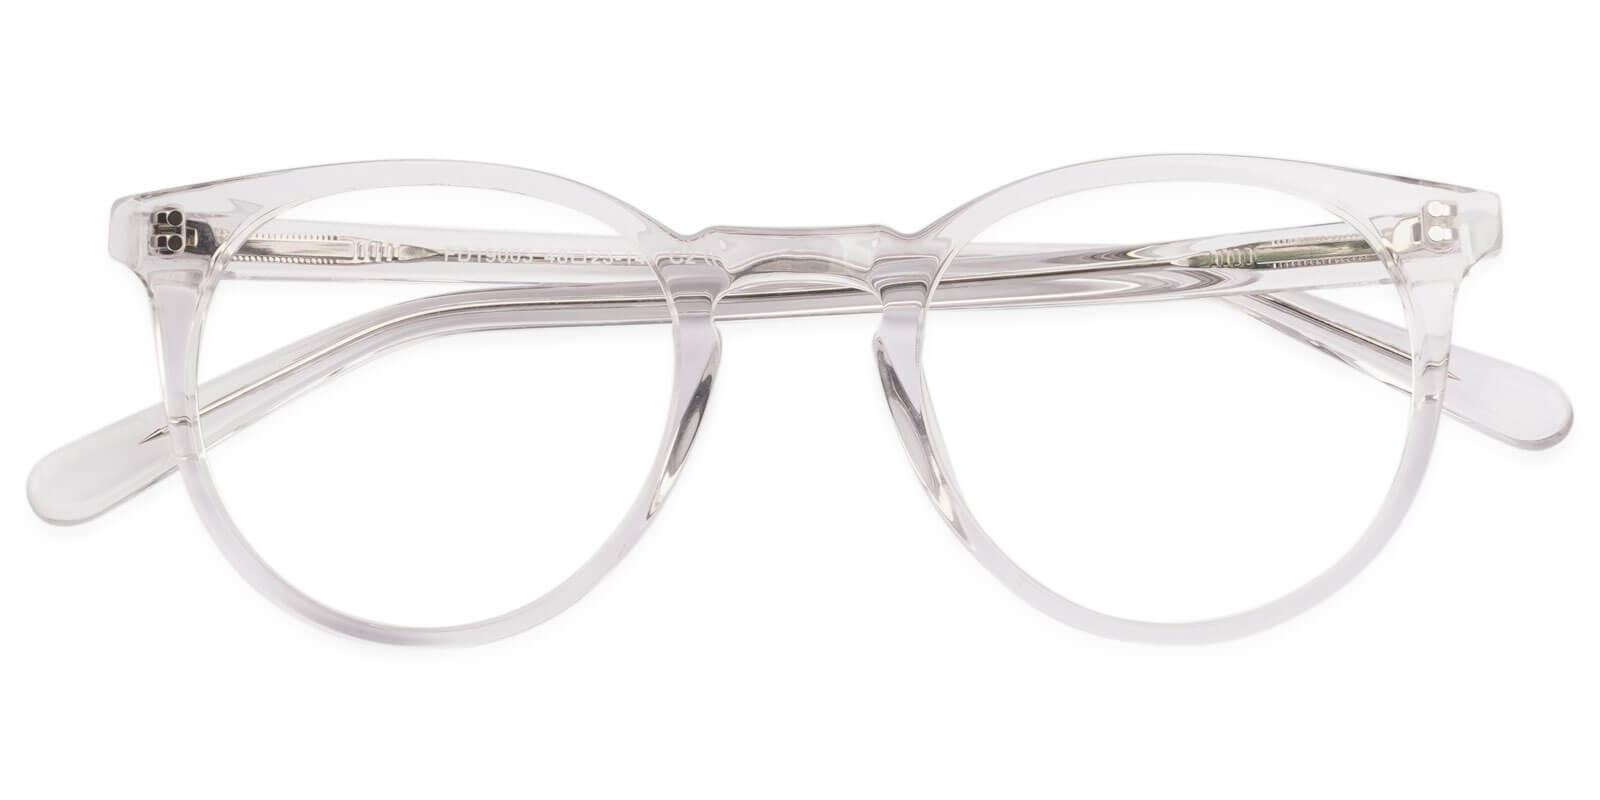 Mercury Translucent Acetate Eyeglasses , UniversalBridgeFit Frames from ABBE Glasses